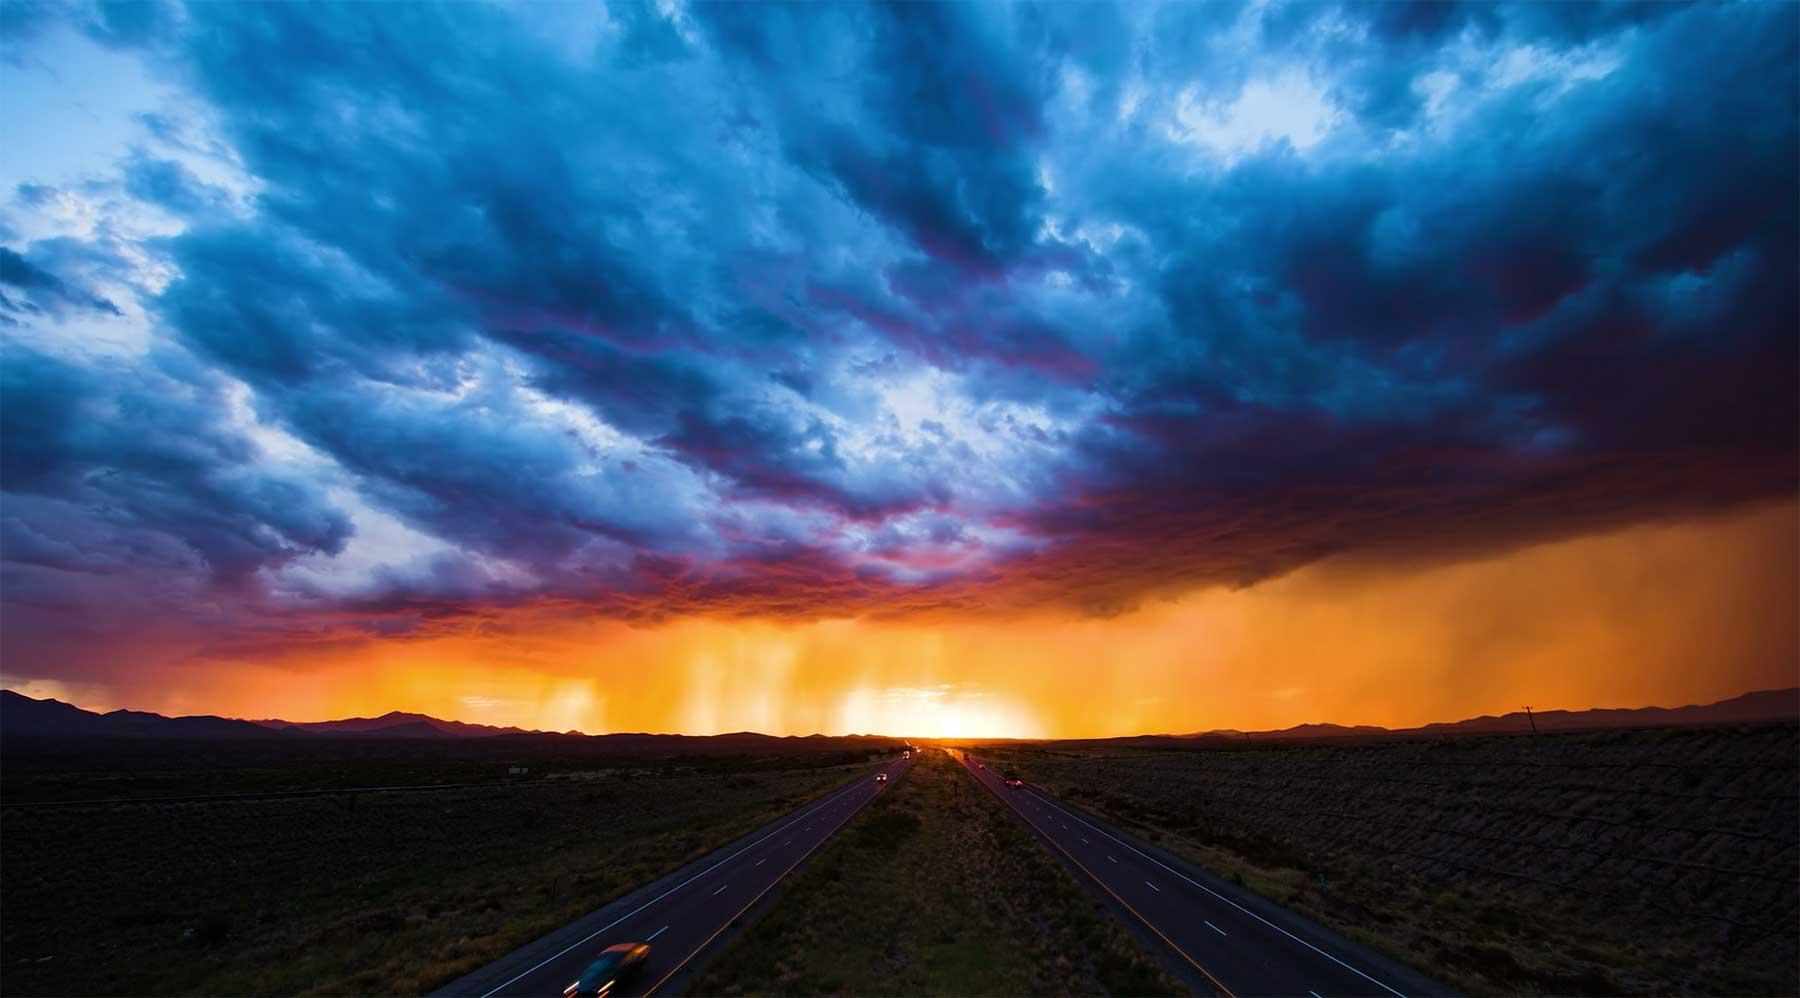 Schöner Stürmen: Monsoon IV monsoon-4